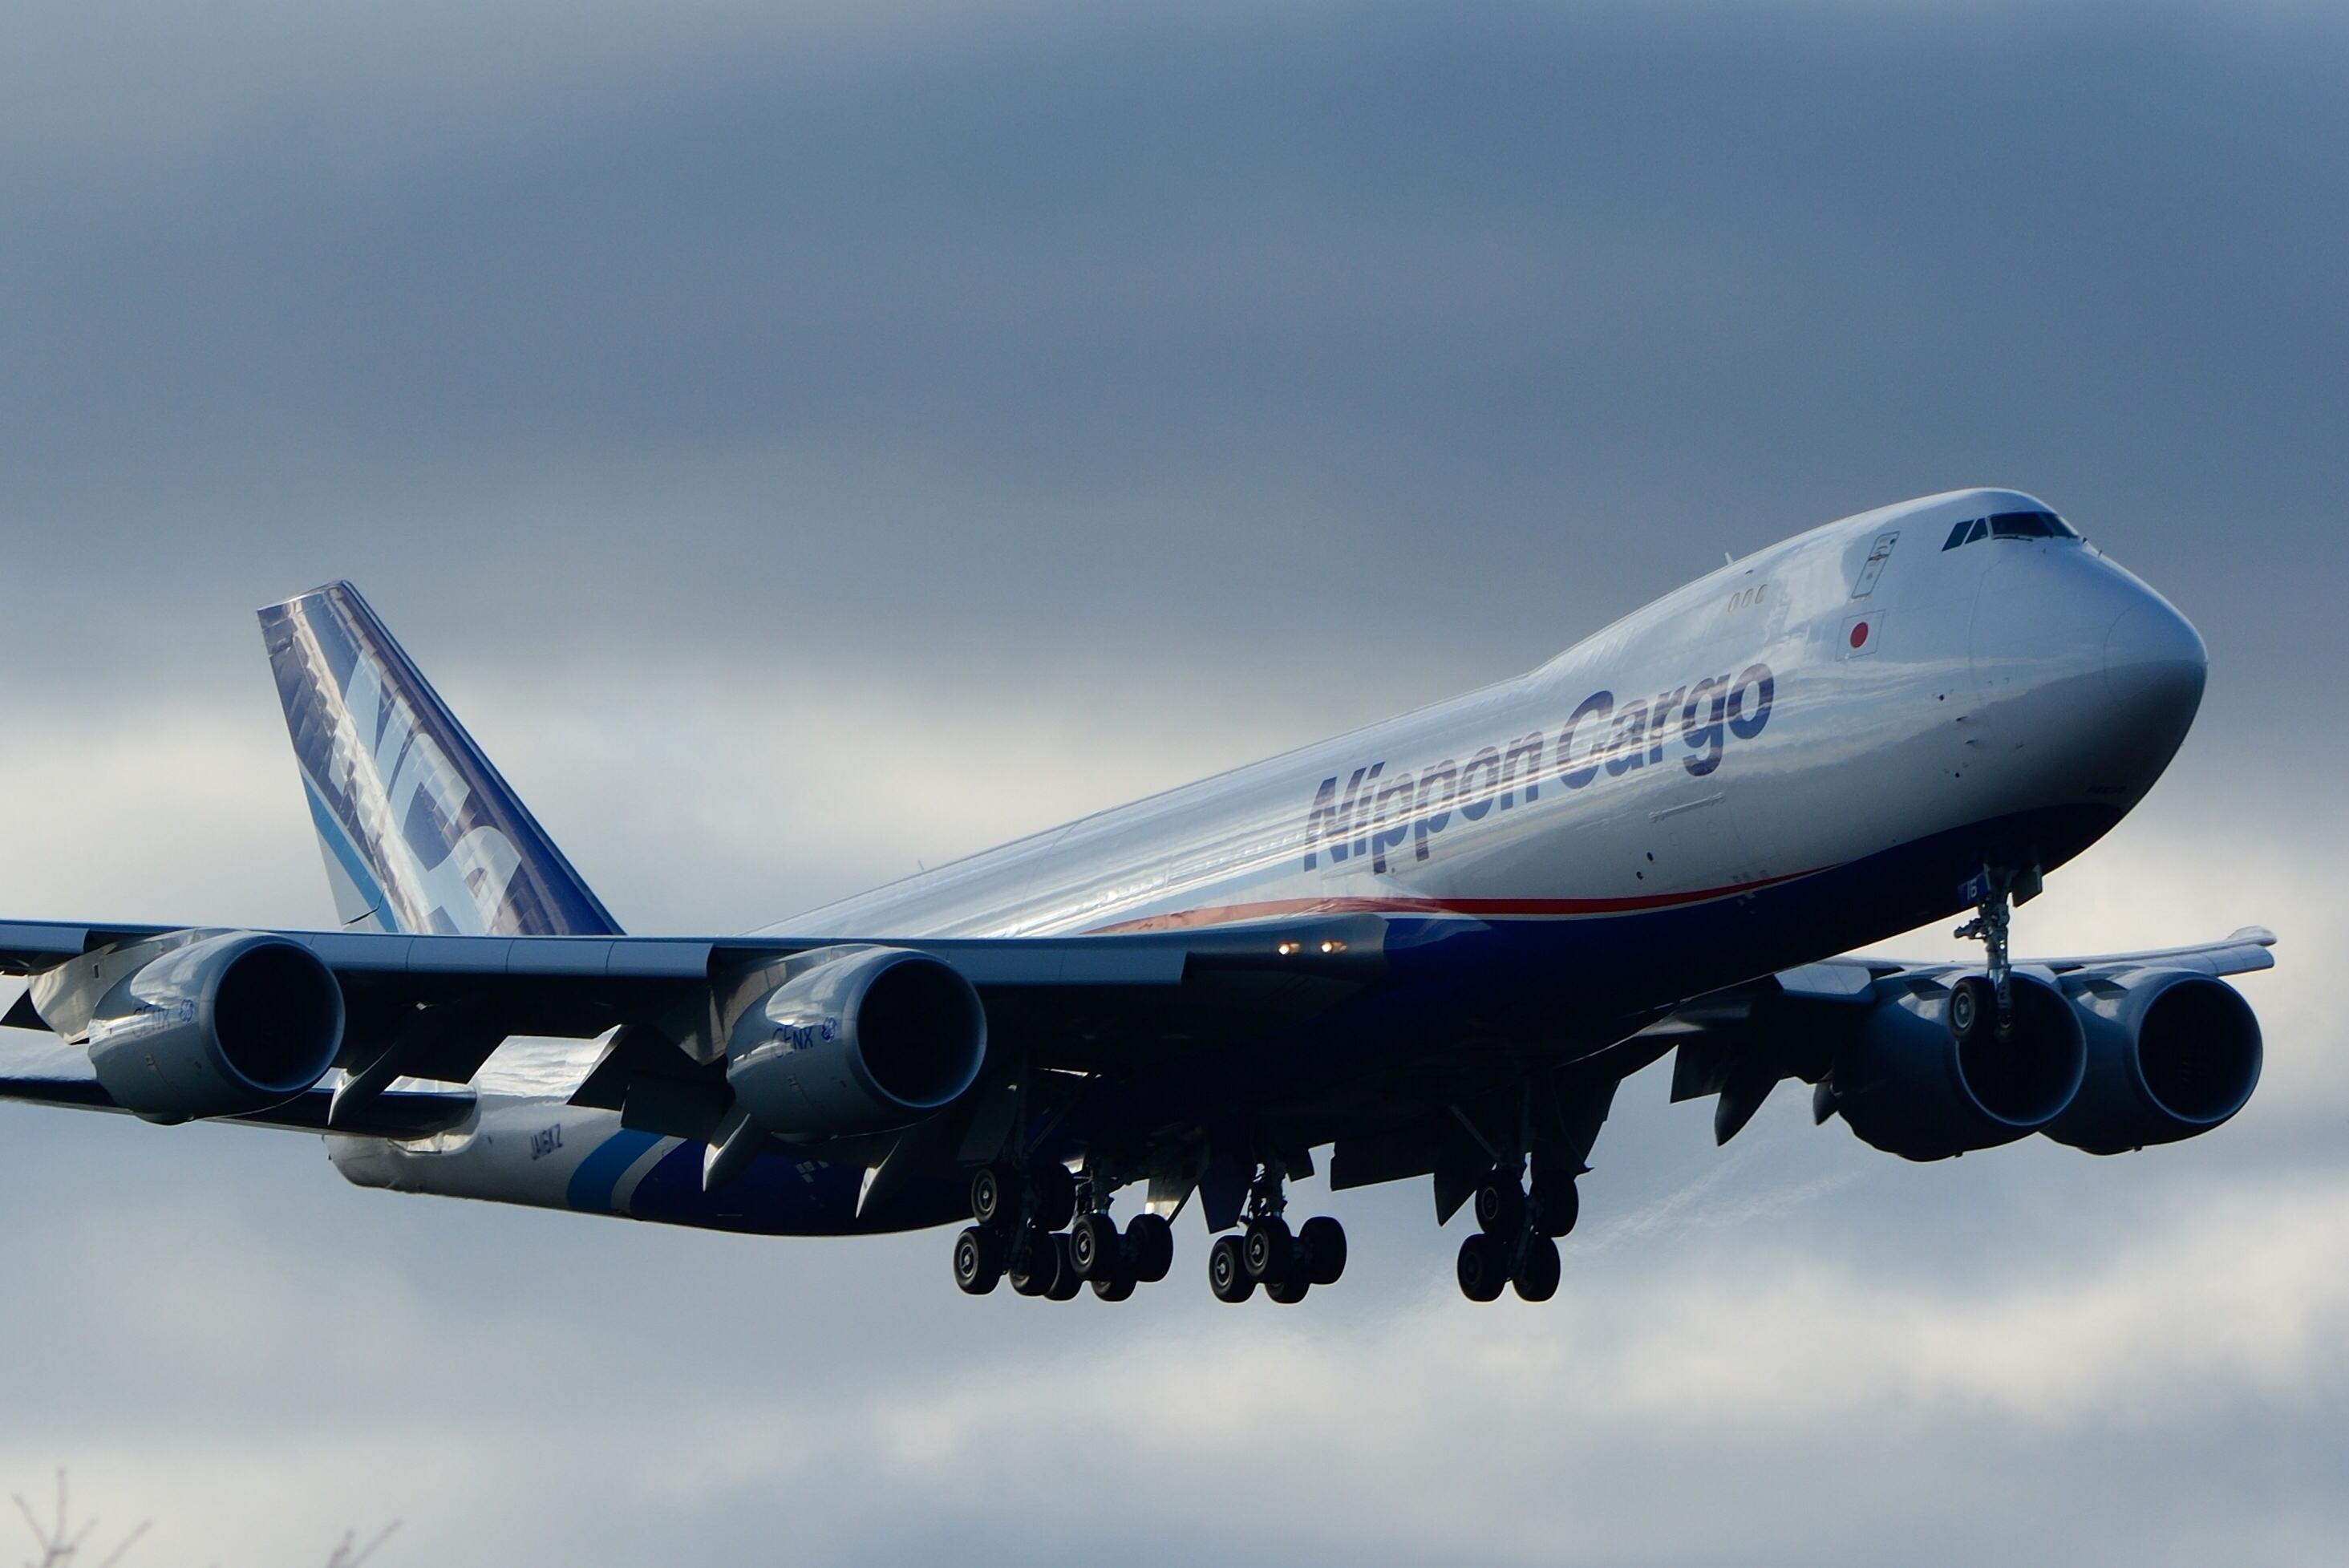 File:Nippon Cargo Airlines, Boeing 747-8F, JA16KZ - NRT.jpg